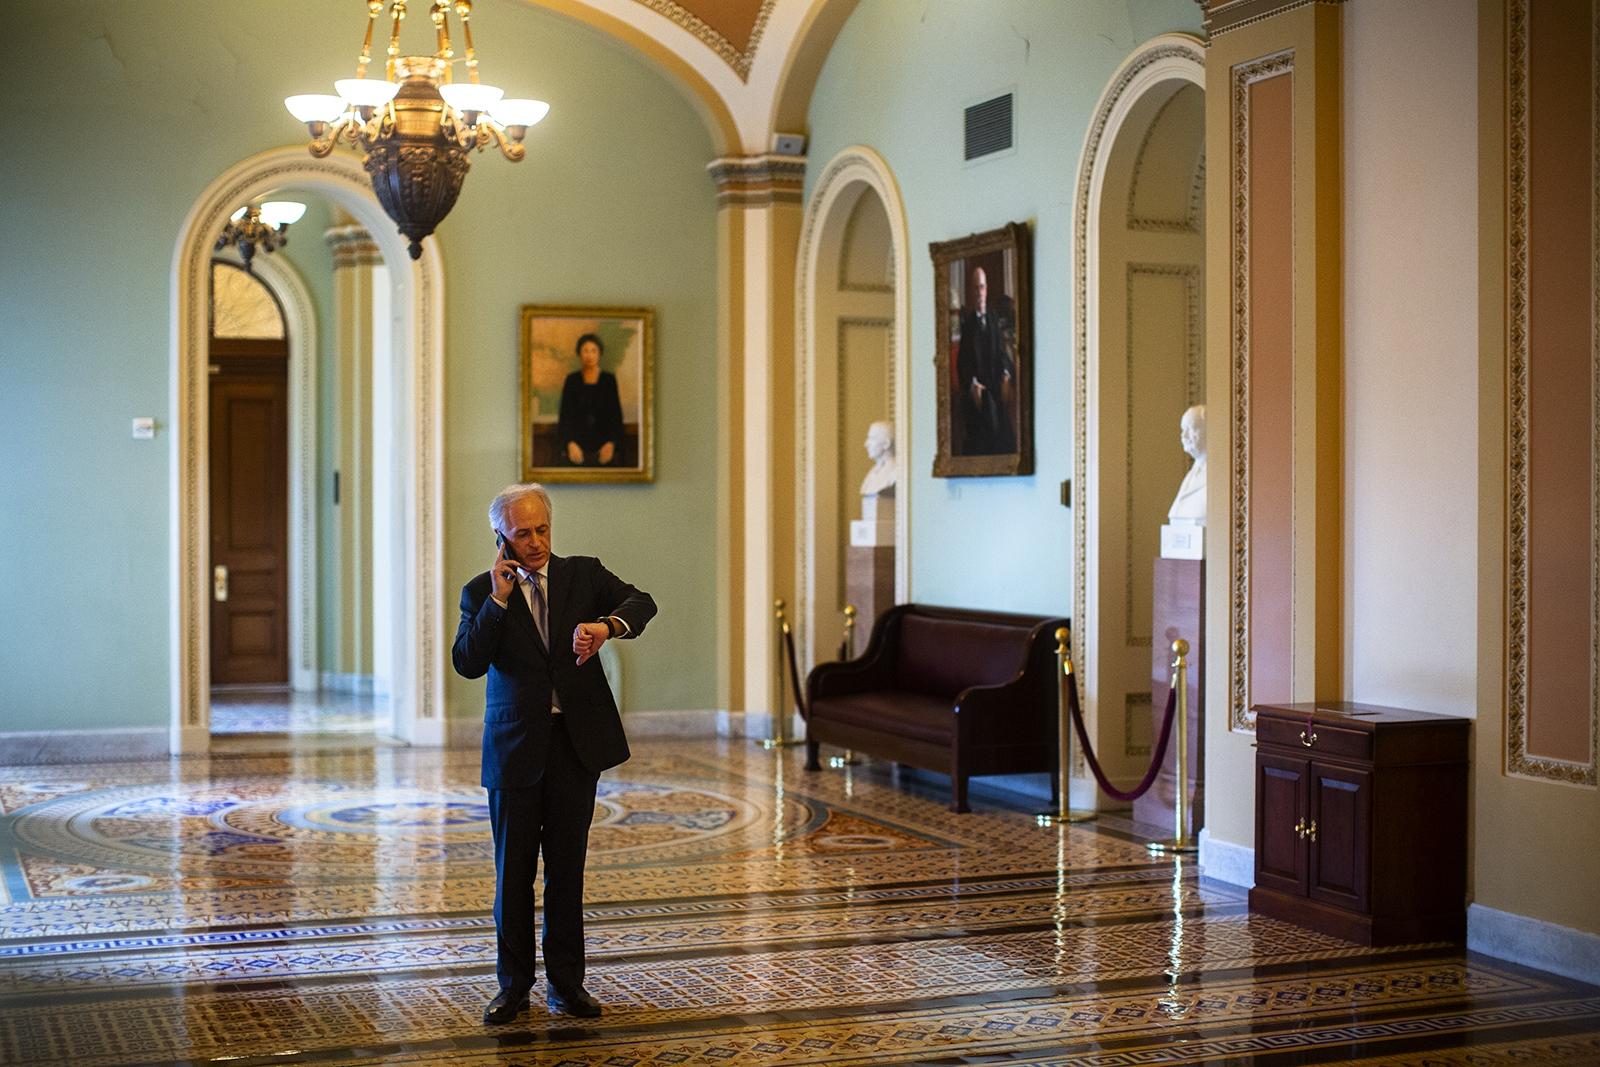 Senator Bob Corker outside the Senate Chamber on Friday, December 21st, 2018, just hours before the government shutdown.